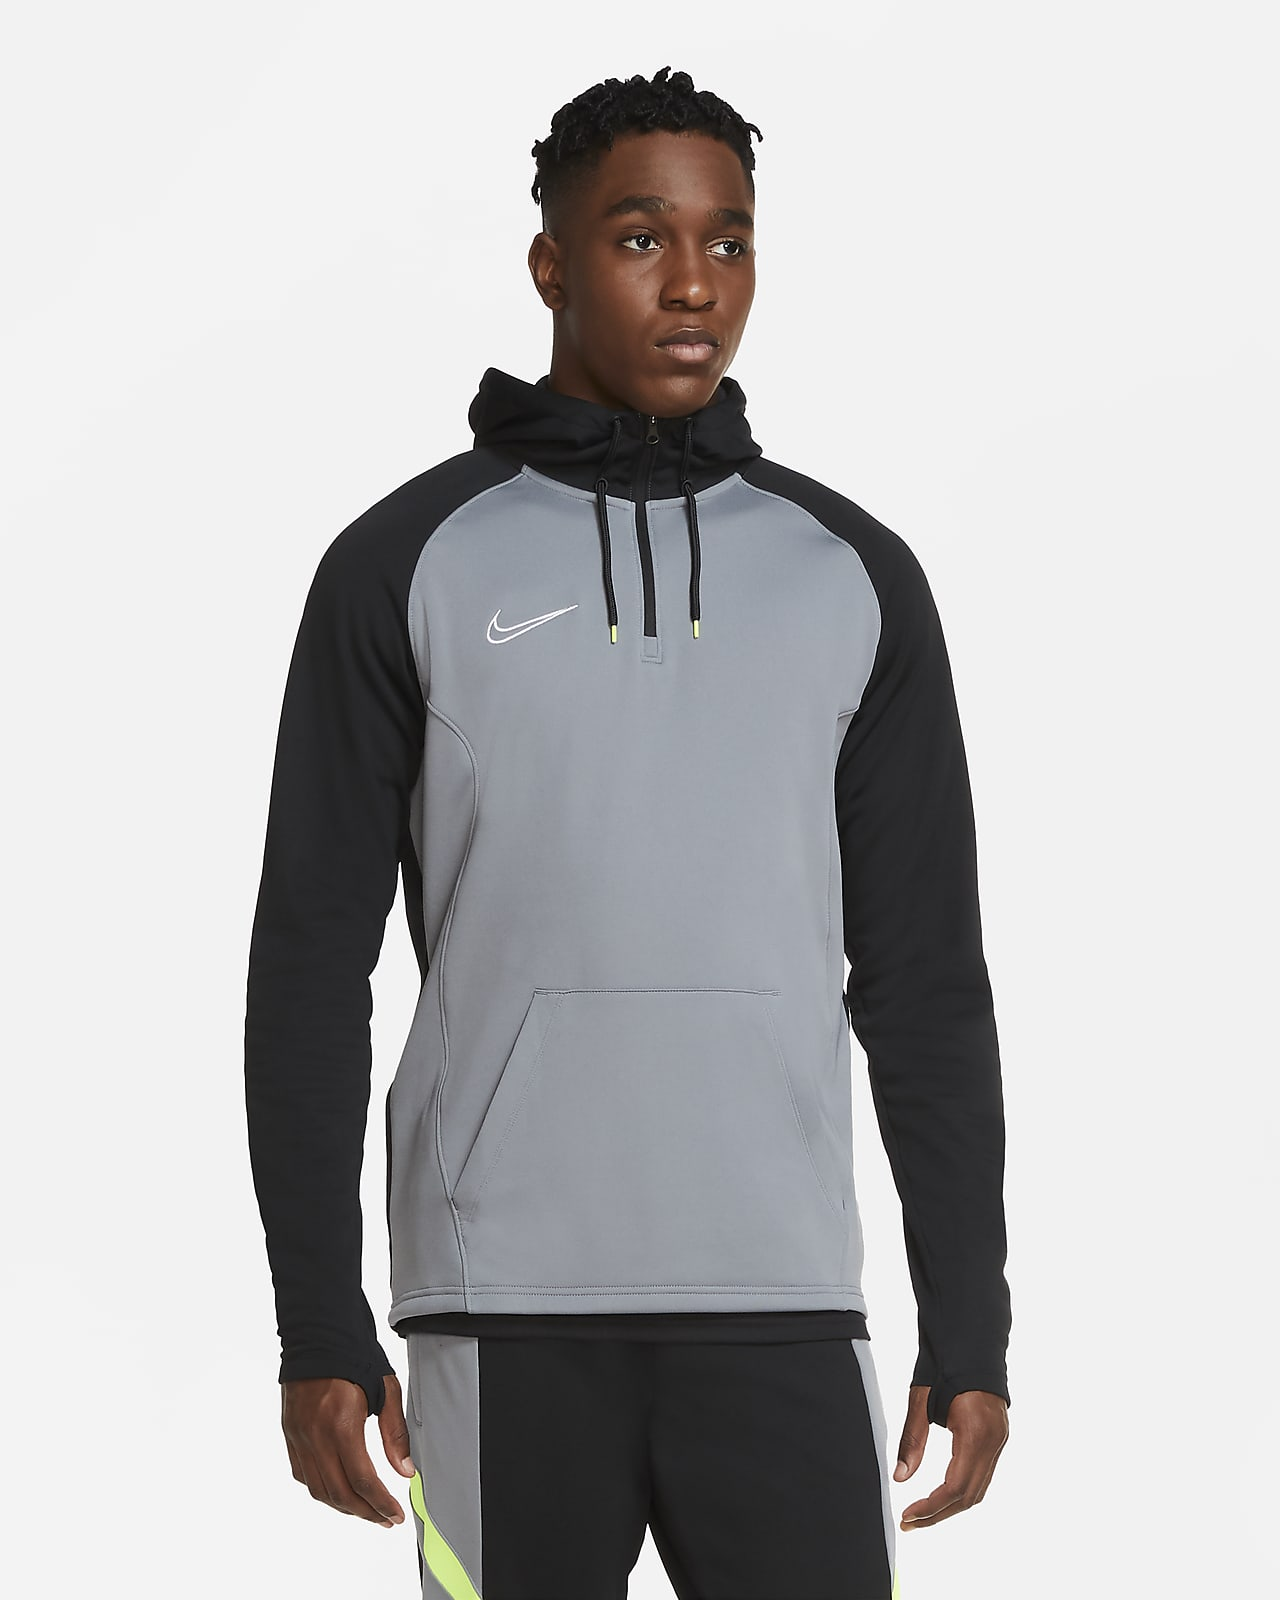 Nike Dri-FIT Academy Men's 1/4-Zip Soccer Drill Hoodie